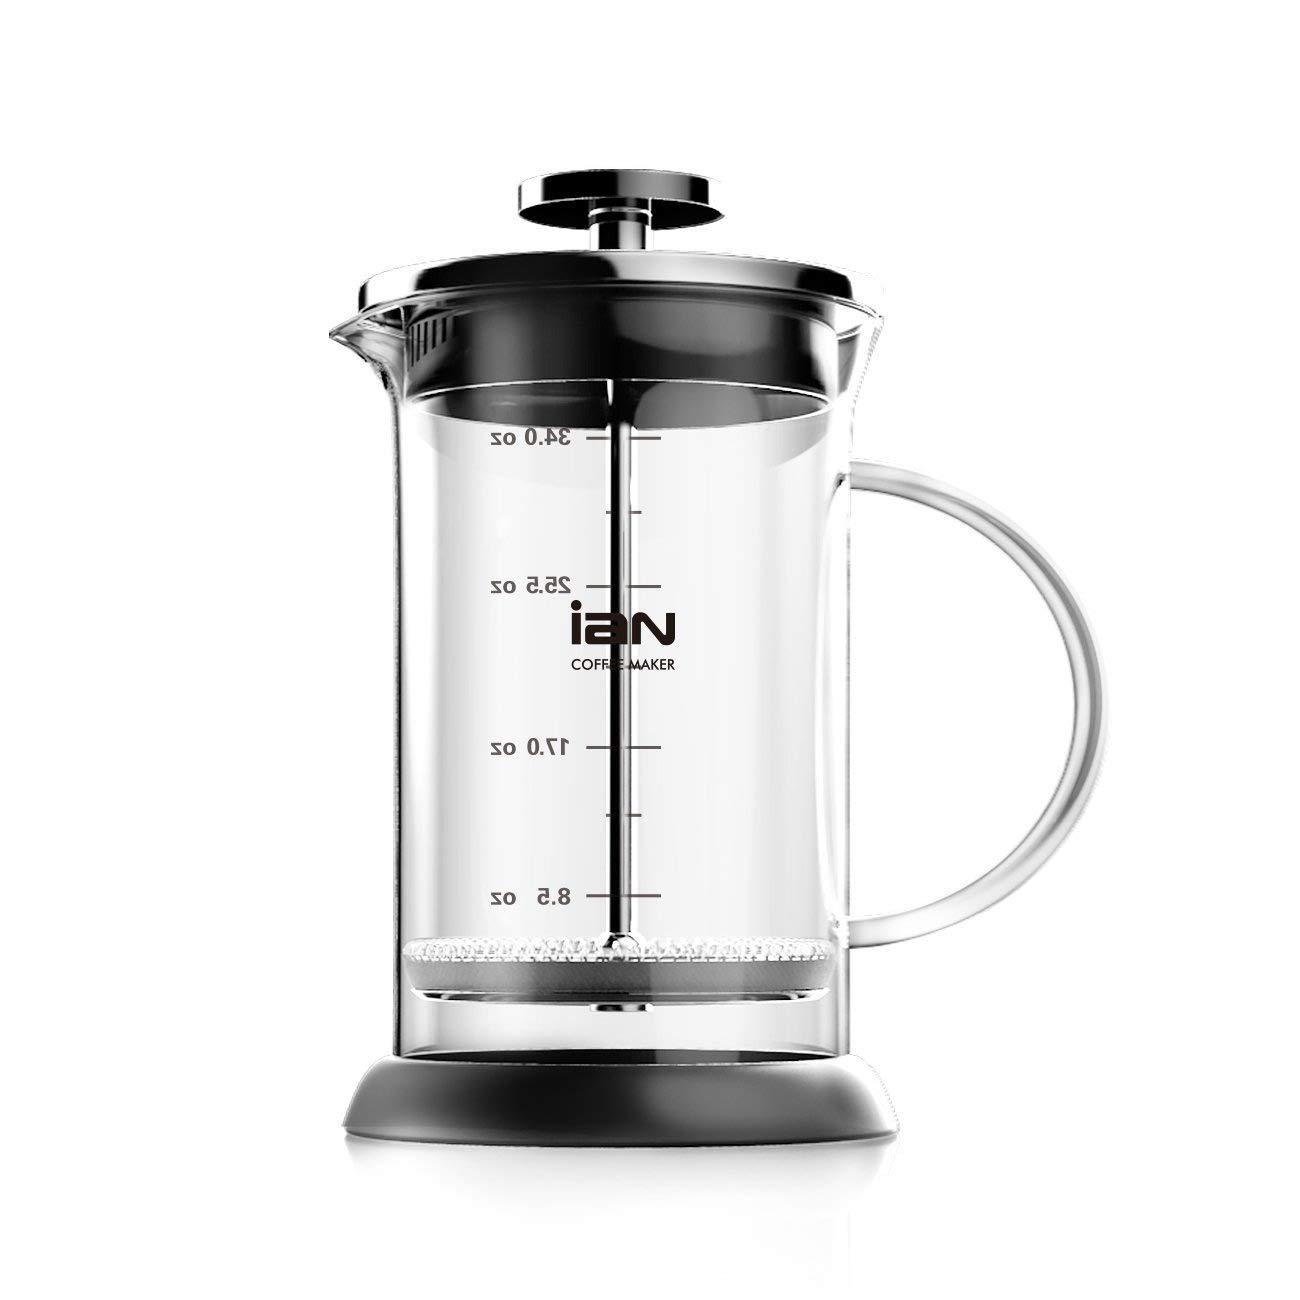 Acquisto Decen 6tazza caffettiera francese caffè Press Tea Press stainless steel Coffee pot 1000ML /34OZ Prezzi offerta